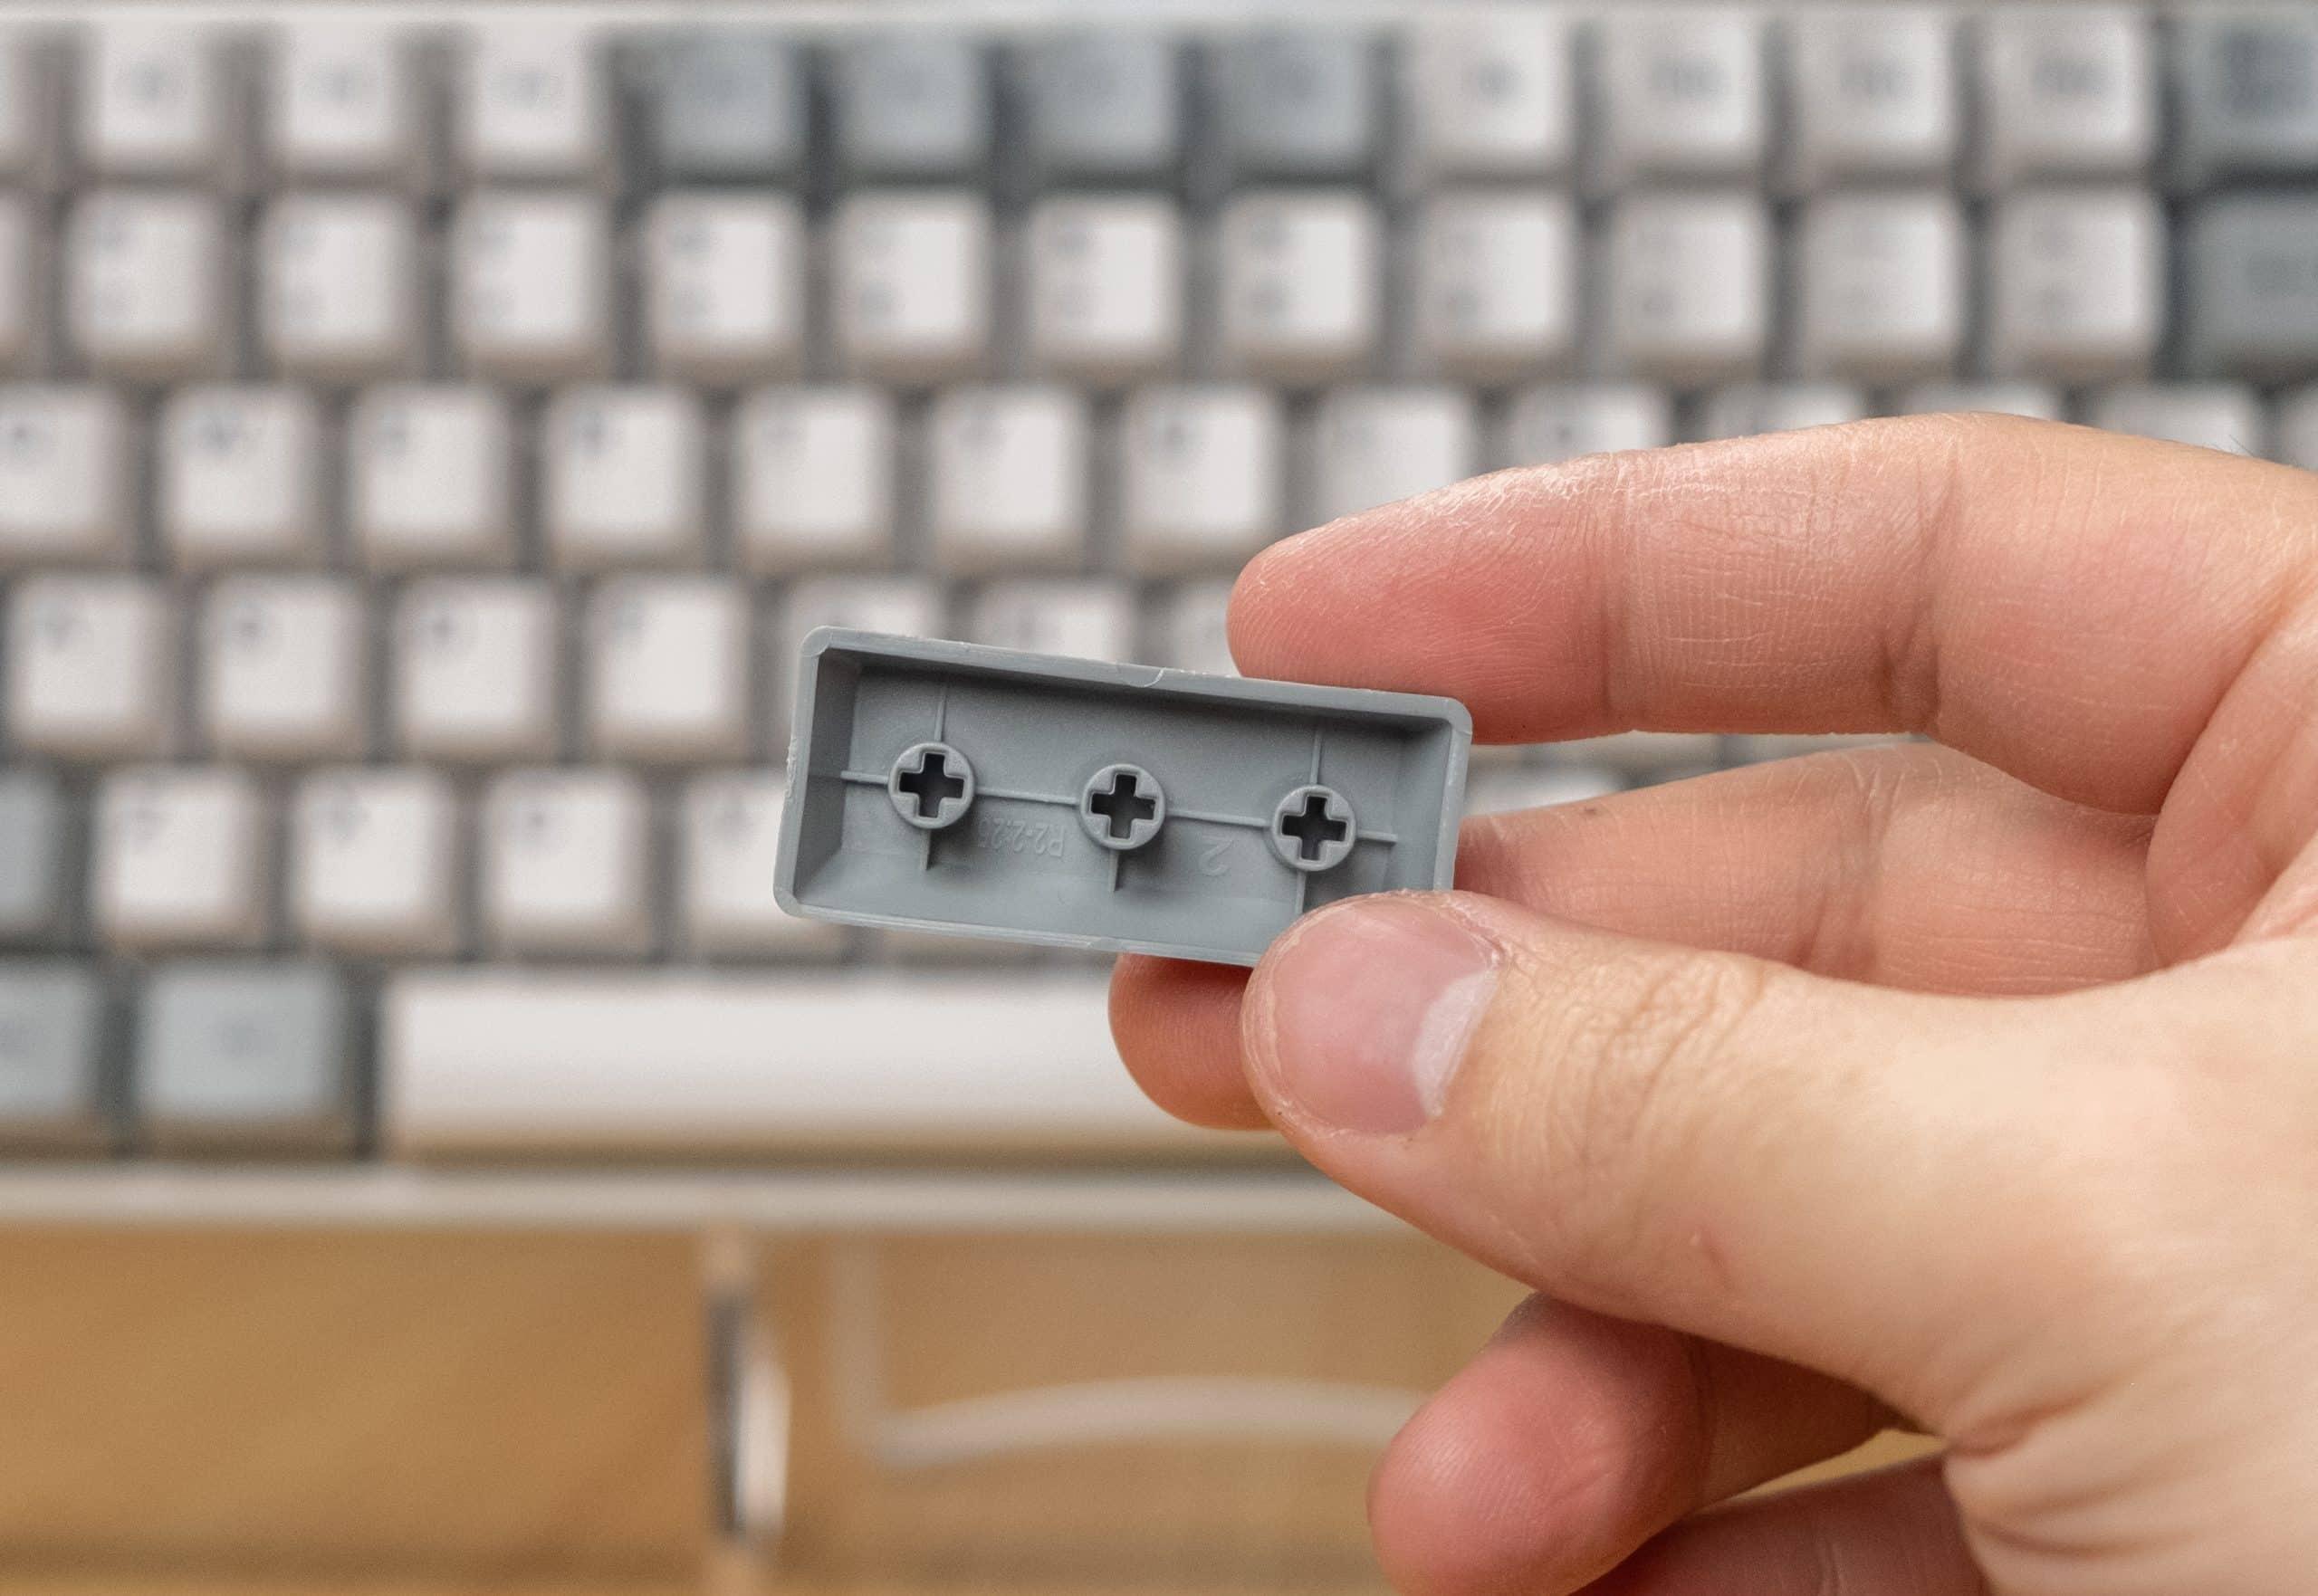 AKKO 3084 - Keycap underside